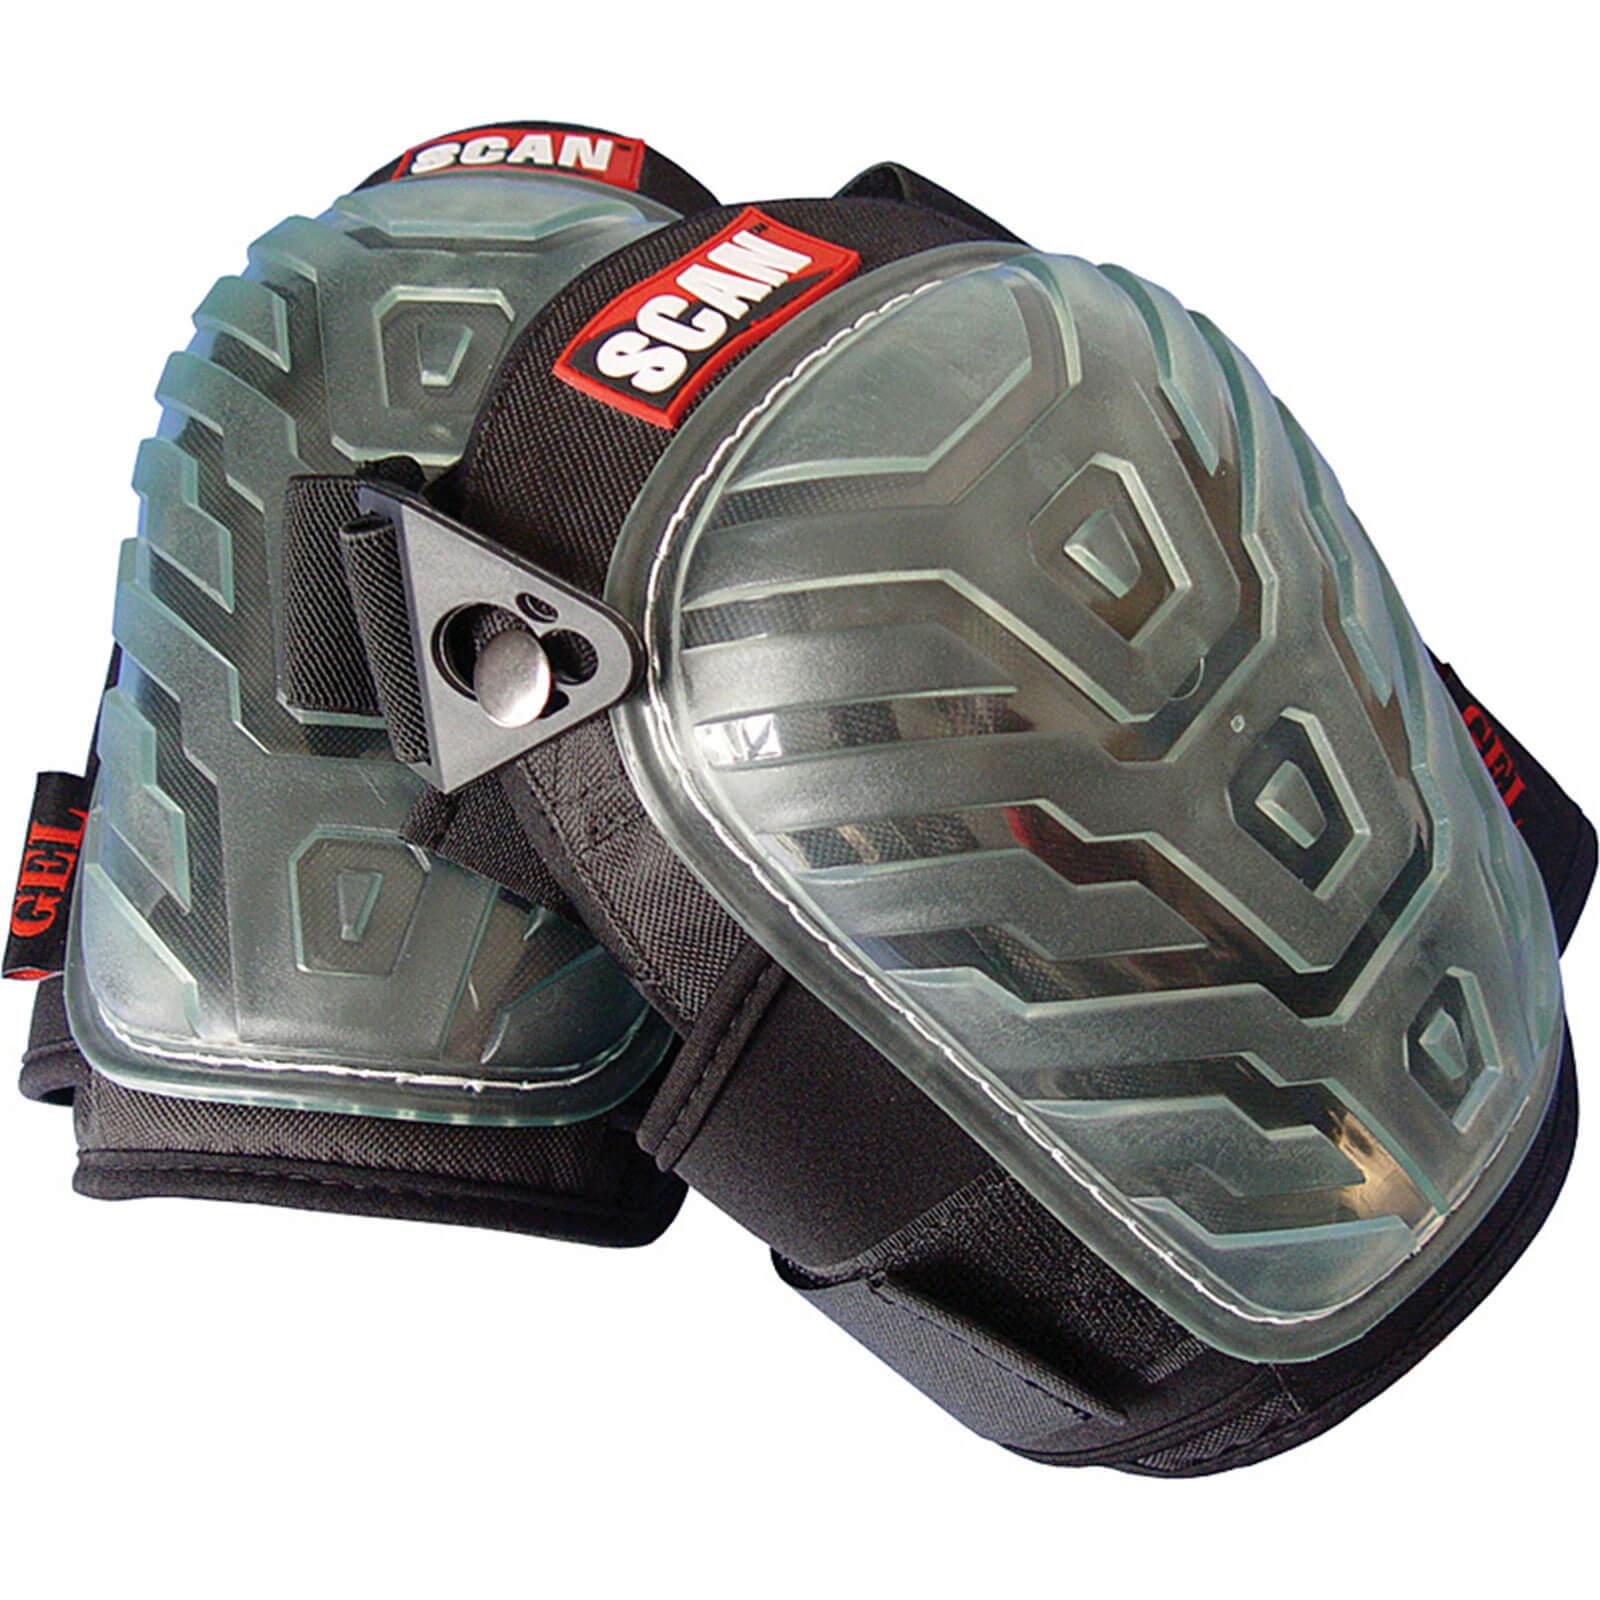 Image of Scan Professional Gel Kneepads